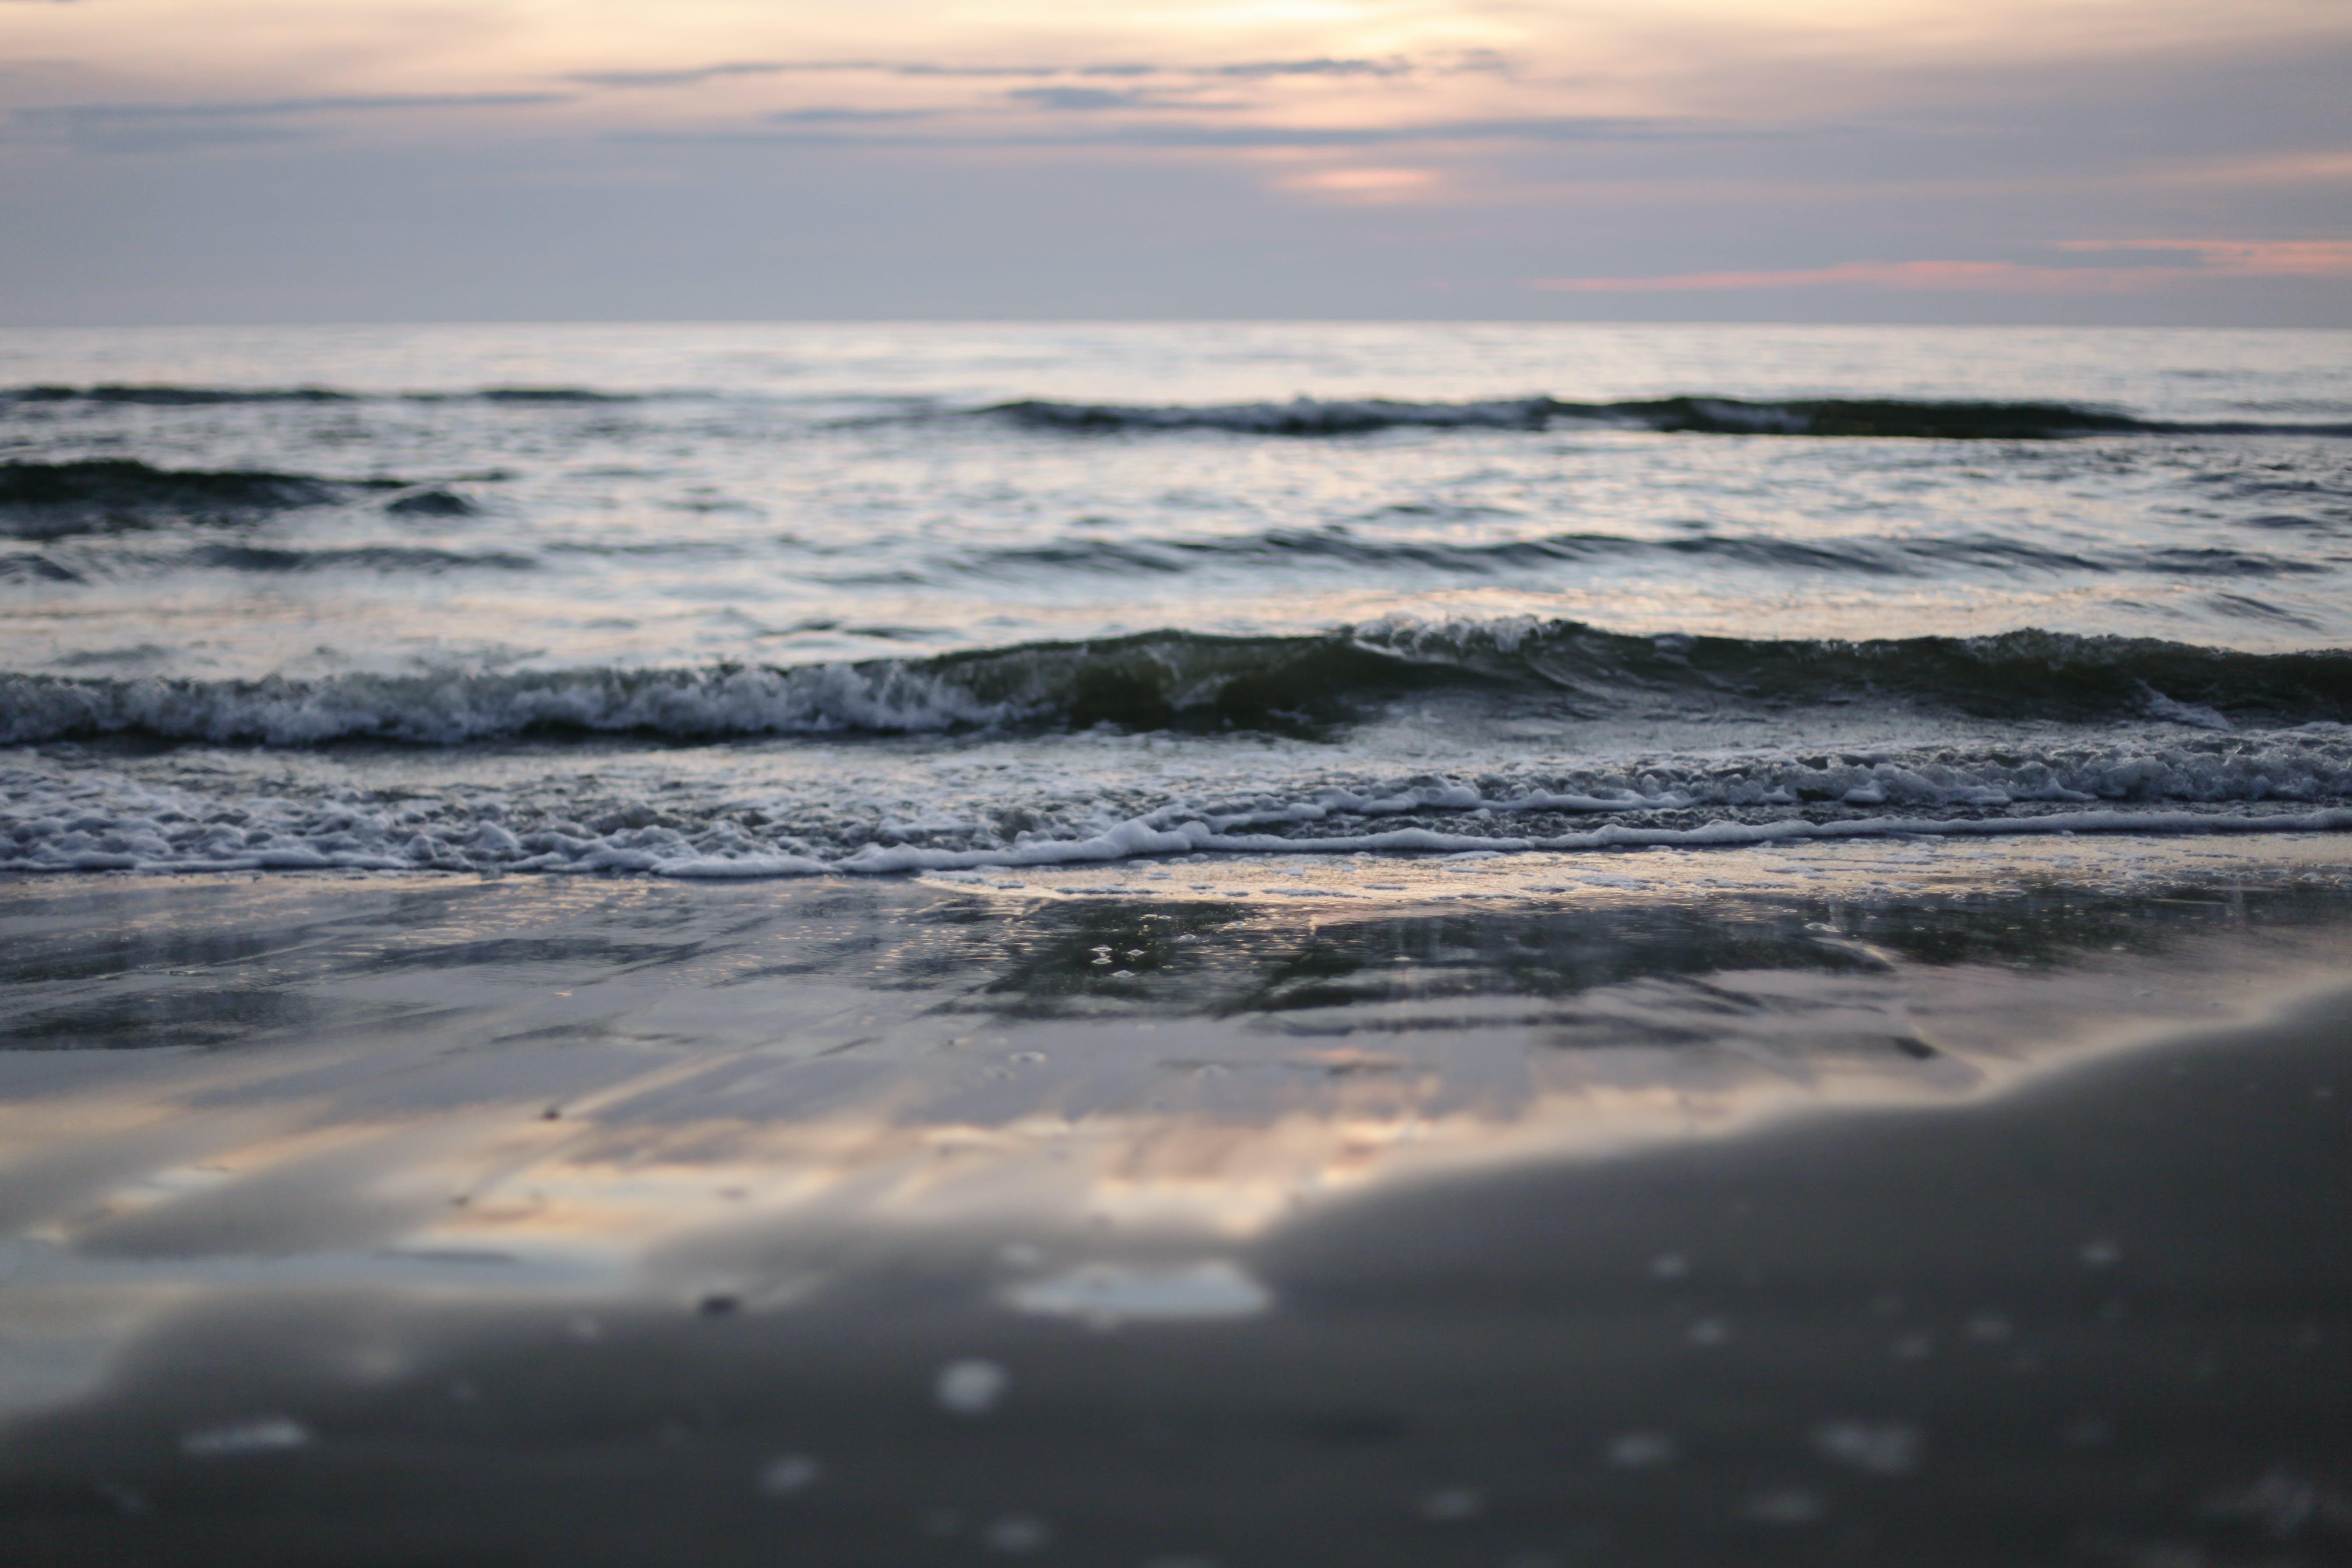 Close-Up Photo of Sea Waves